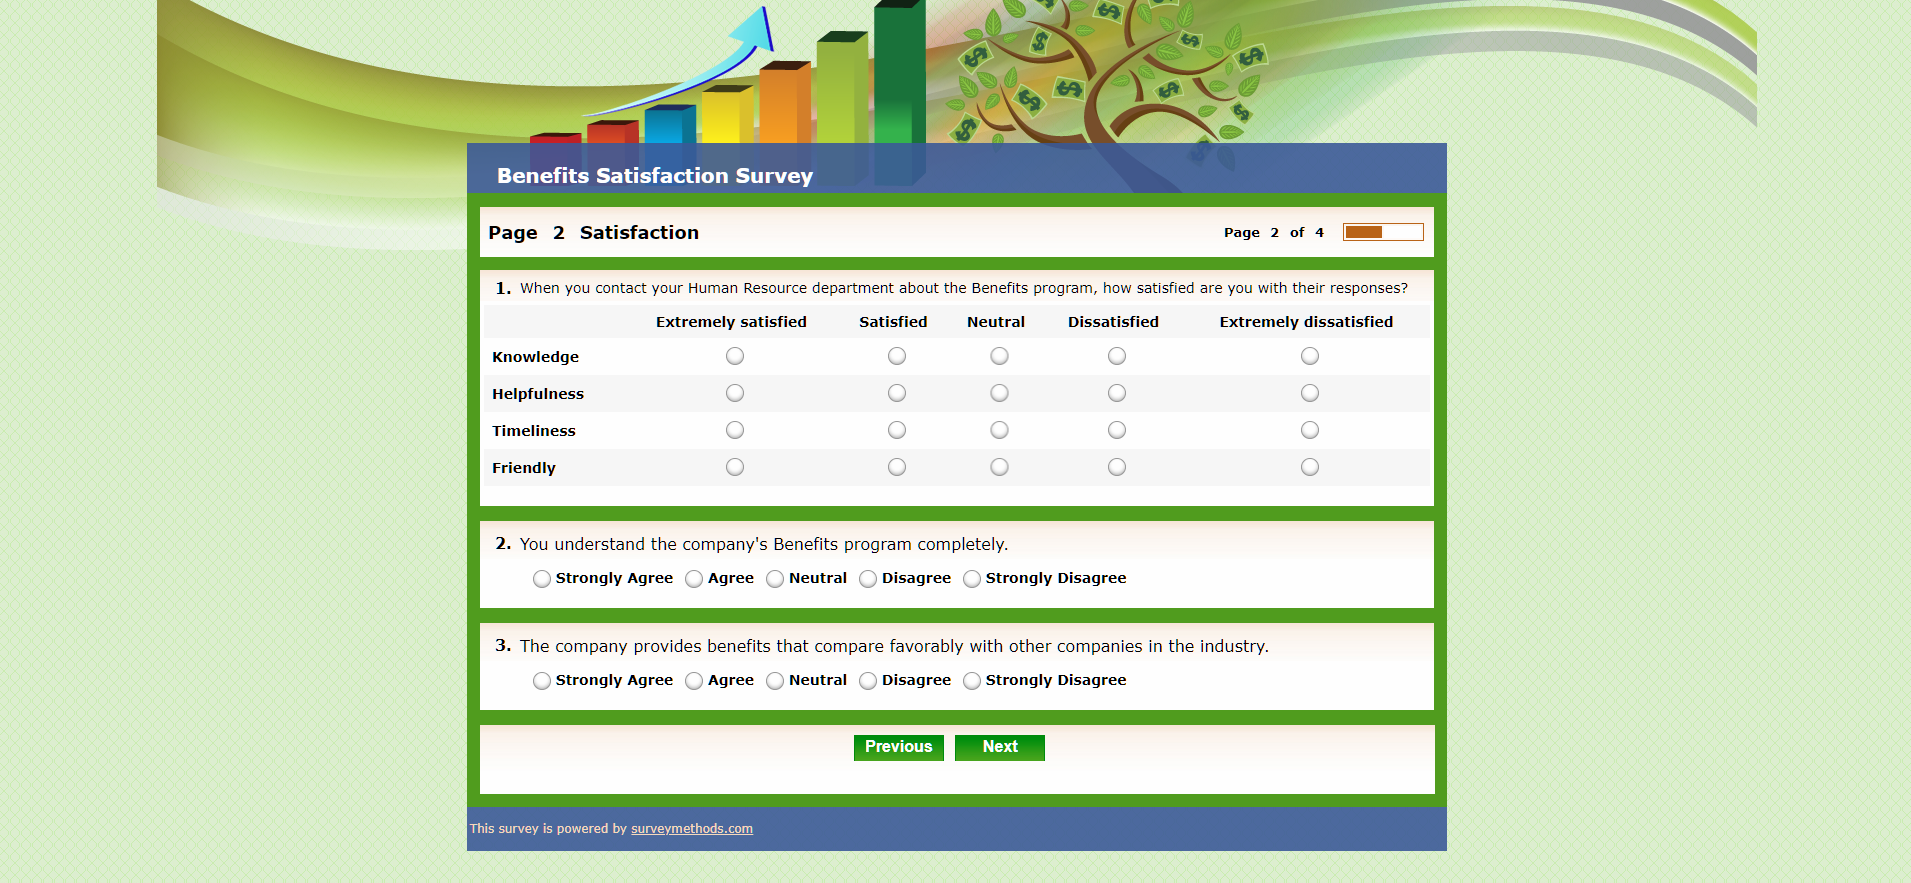 Benefits Satisfaction Survey